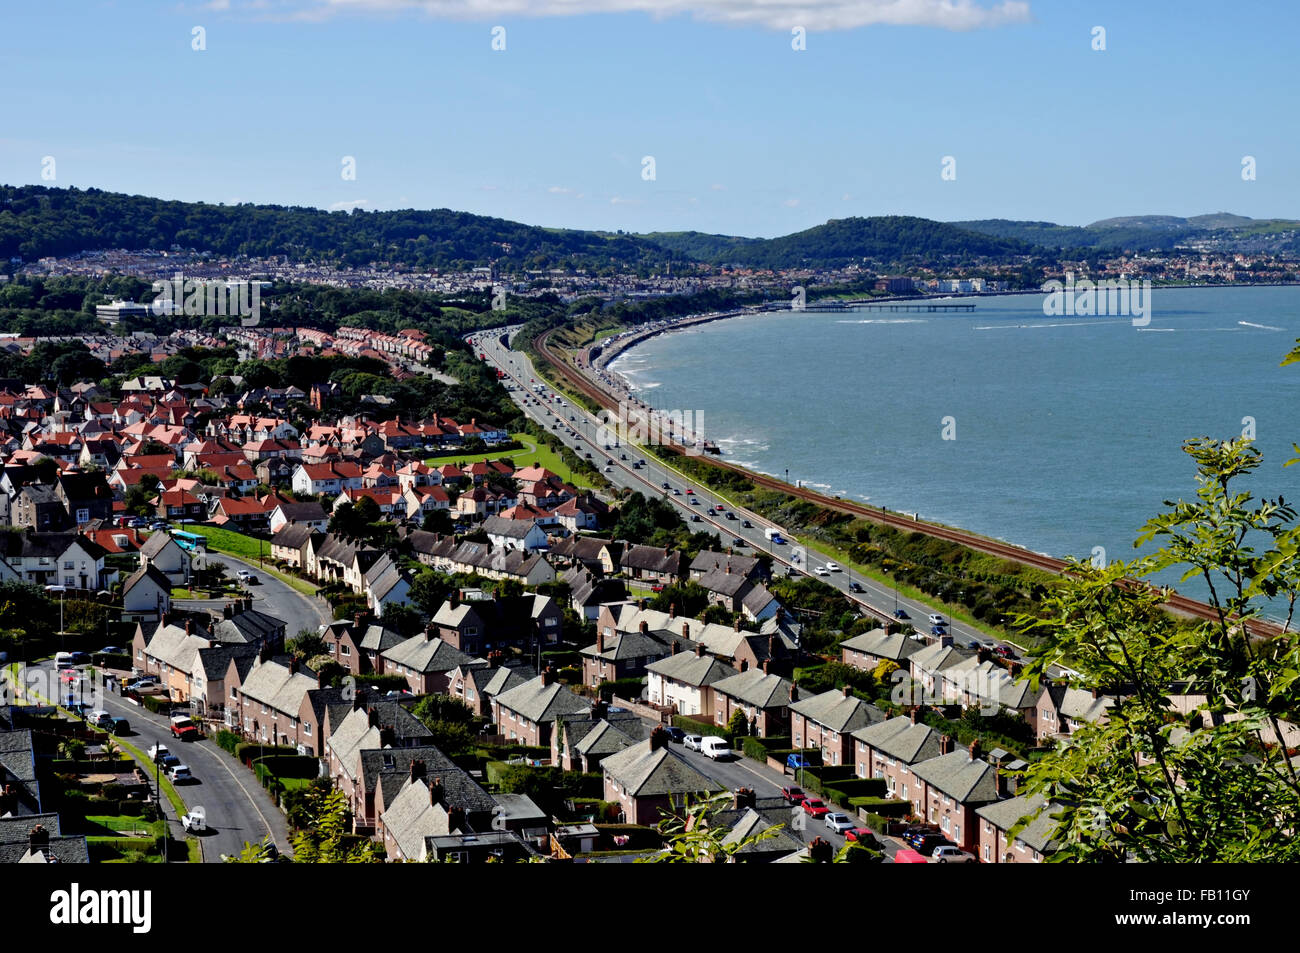 Aerial view of Colwyn Bay, a popular seaside resort in North Wales, United Kingdom - Stock Image